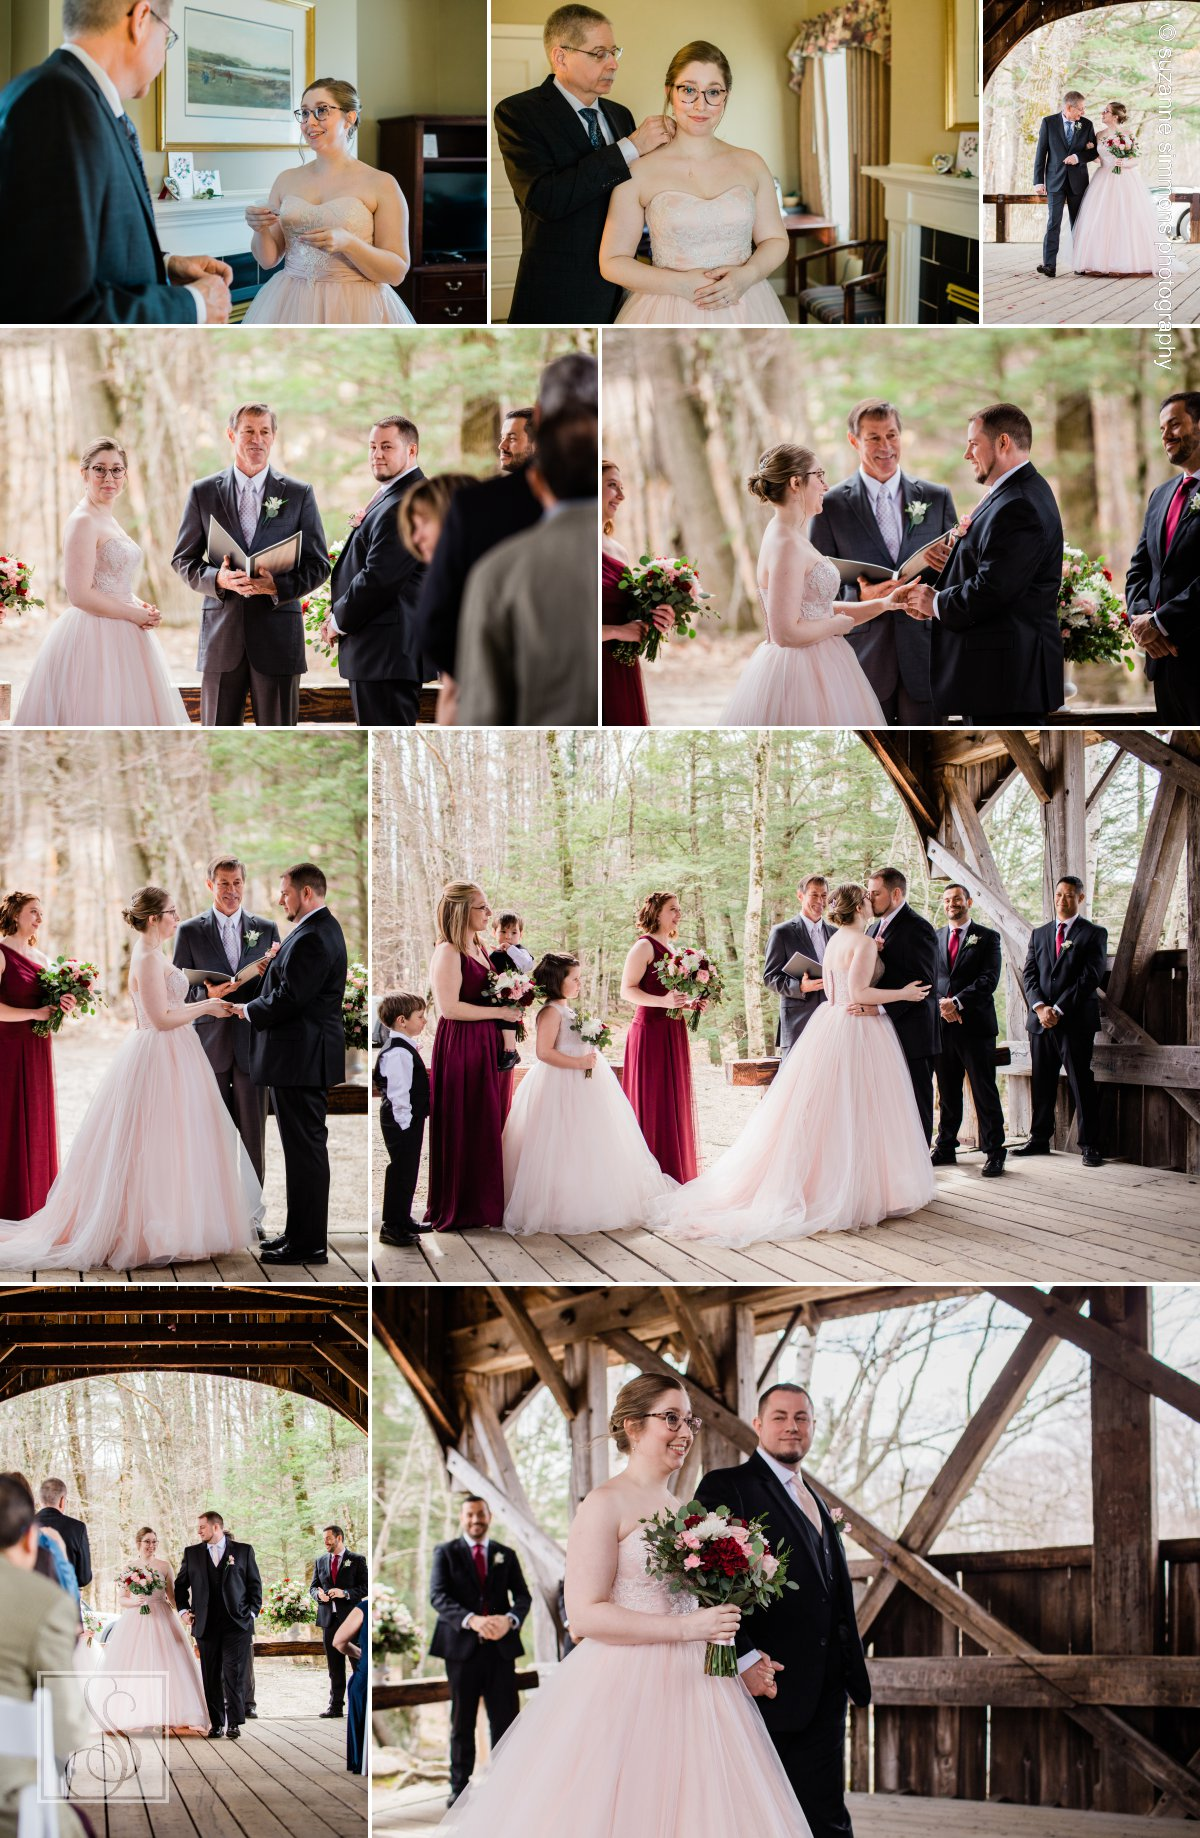 Sunday River Bridge Wedding Ceremony